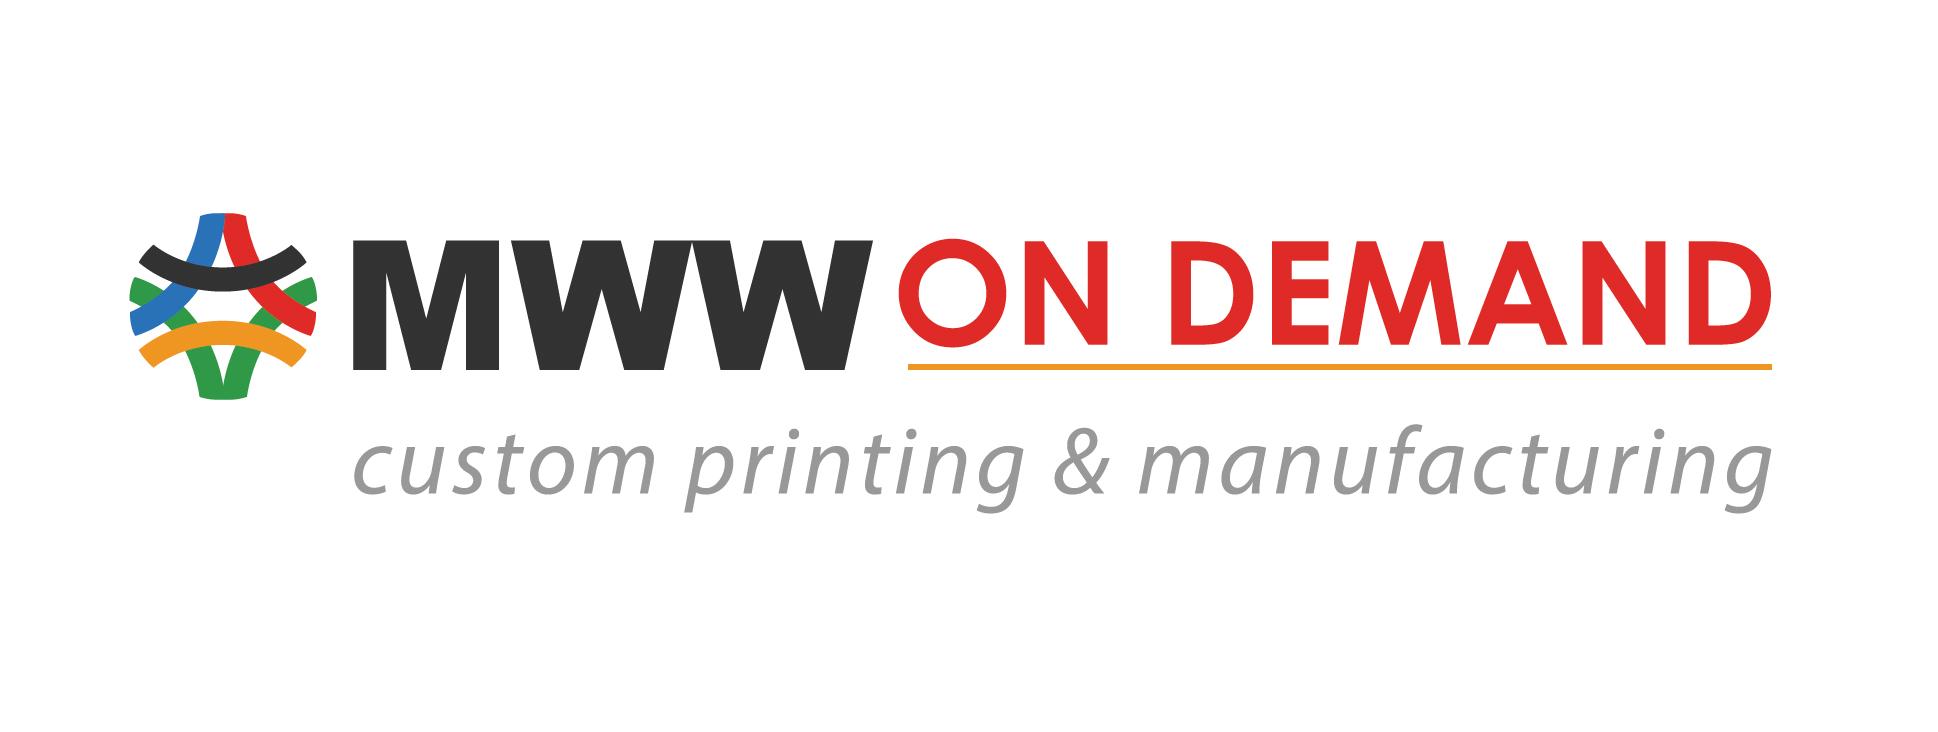 mww-logo.jpg